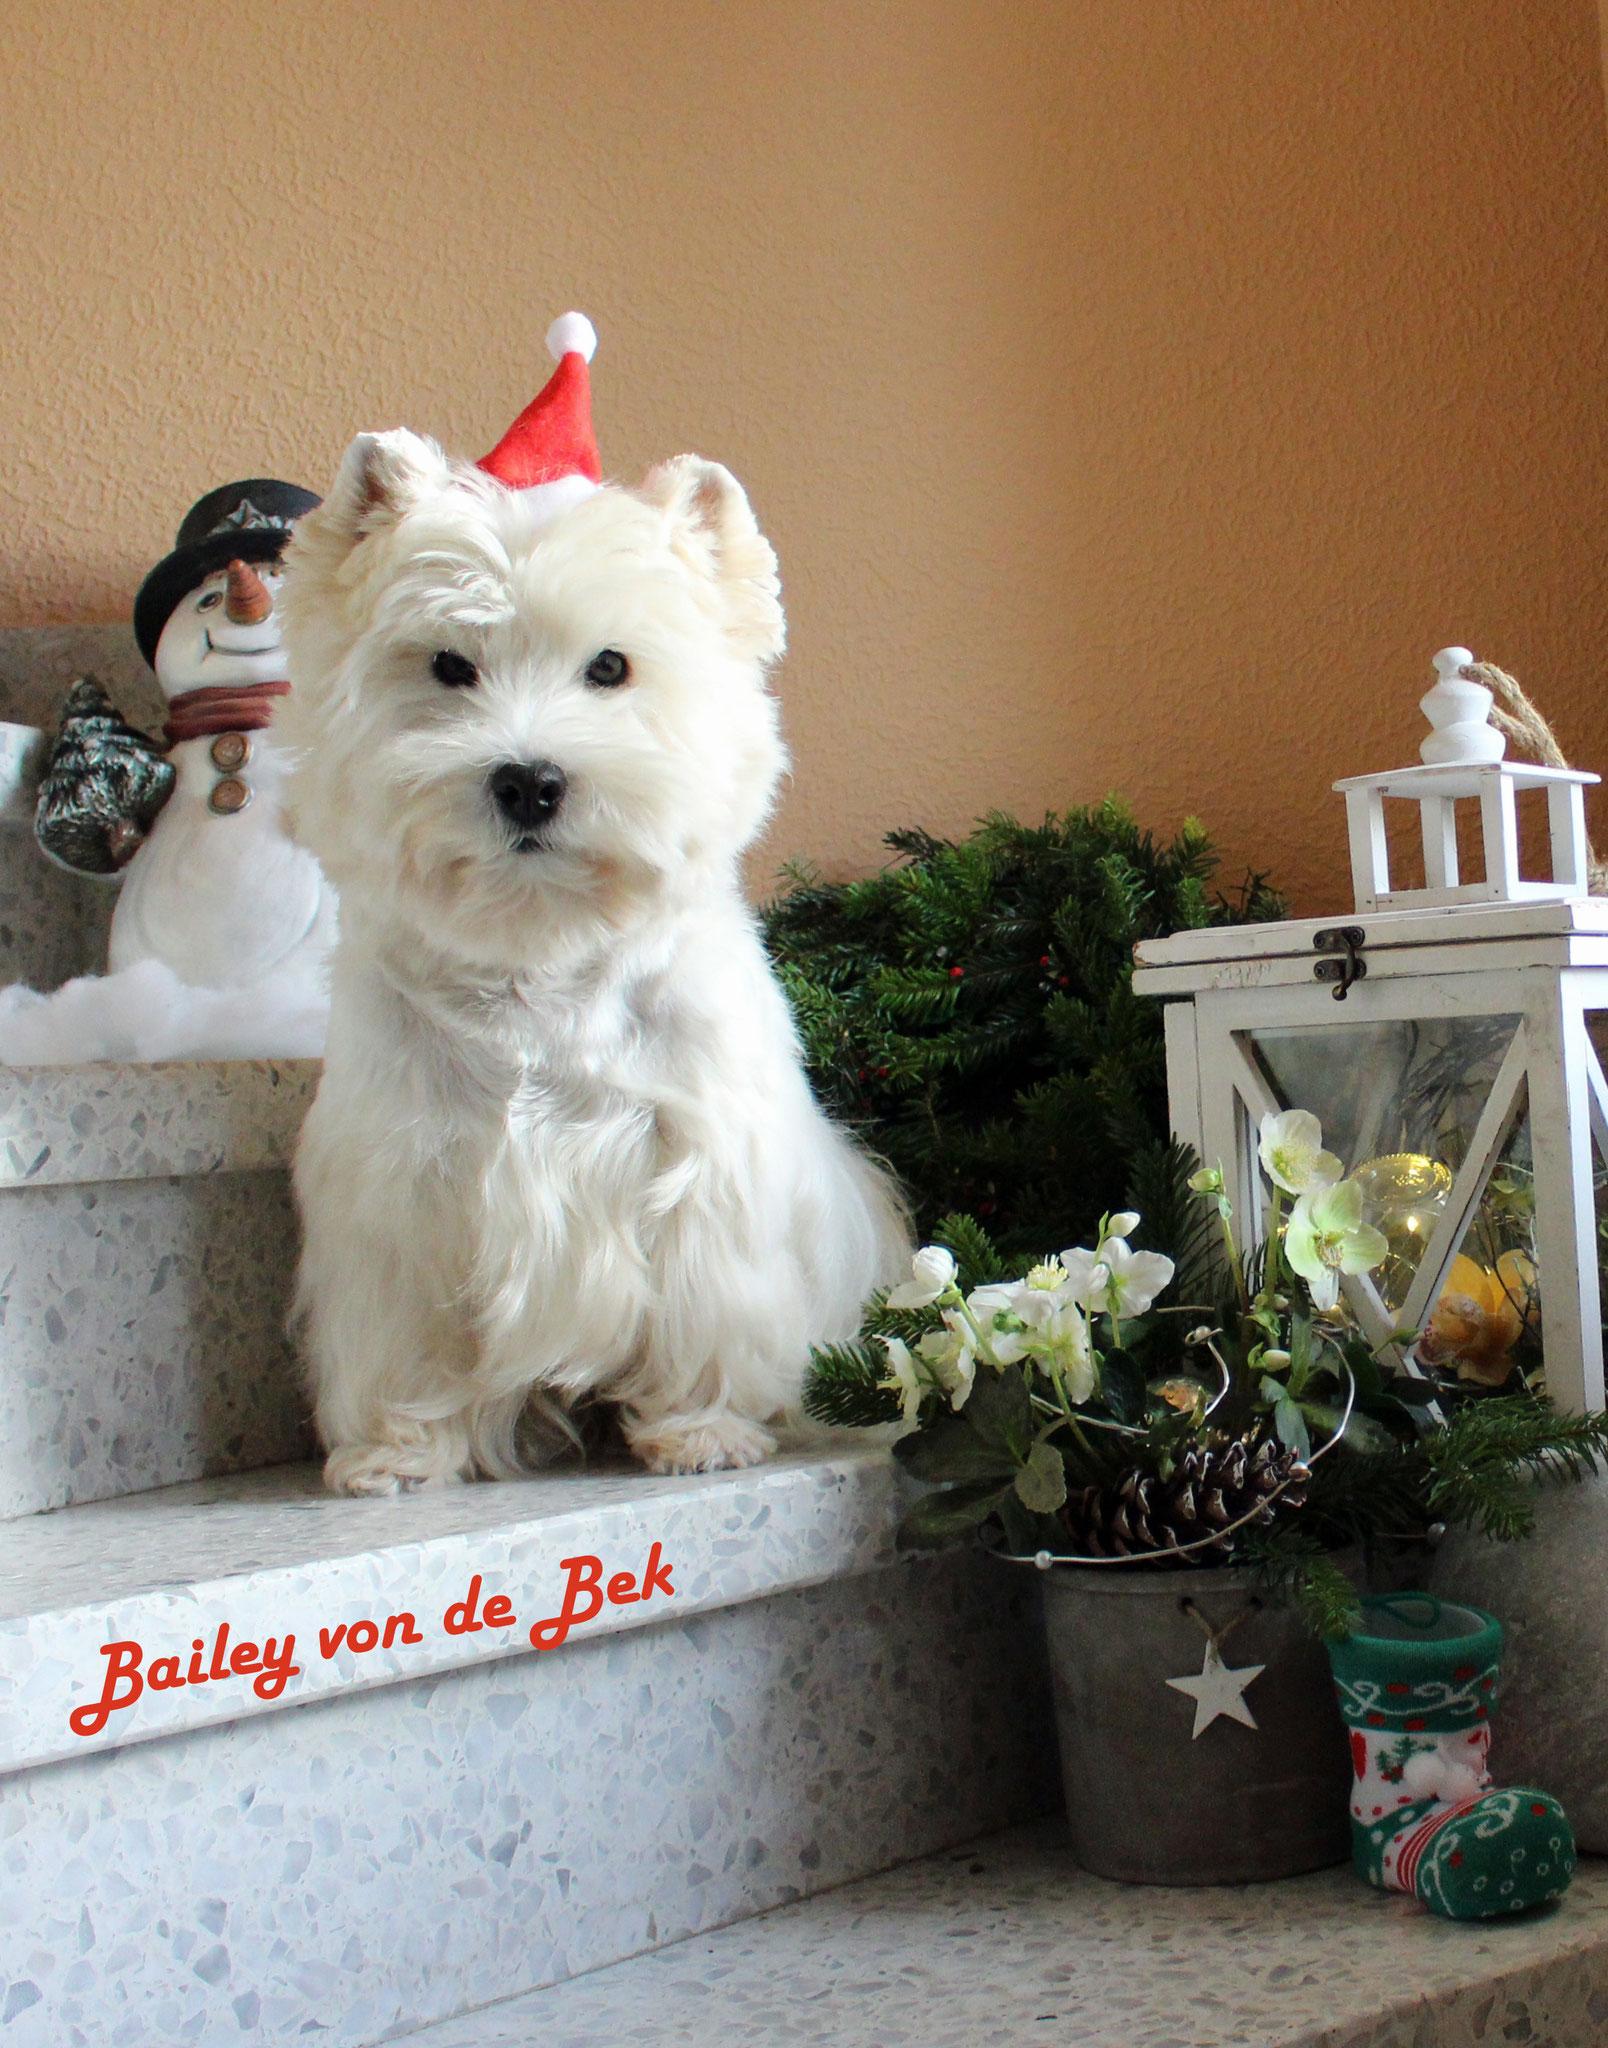 Bailey von de Bek